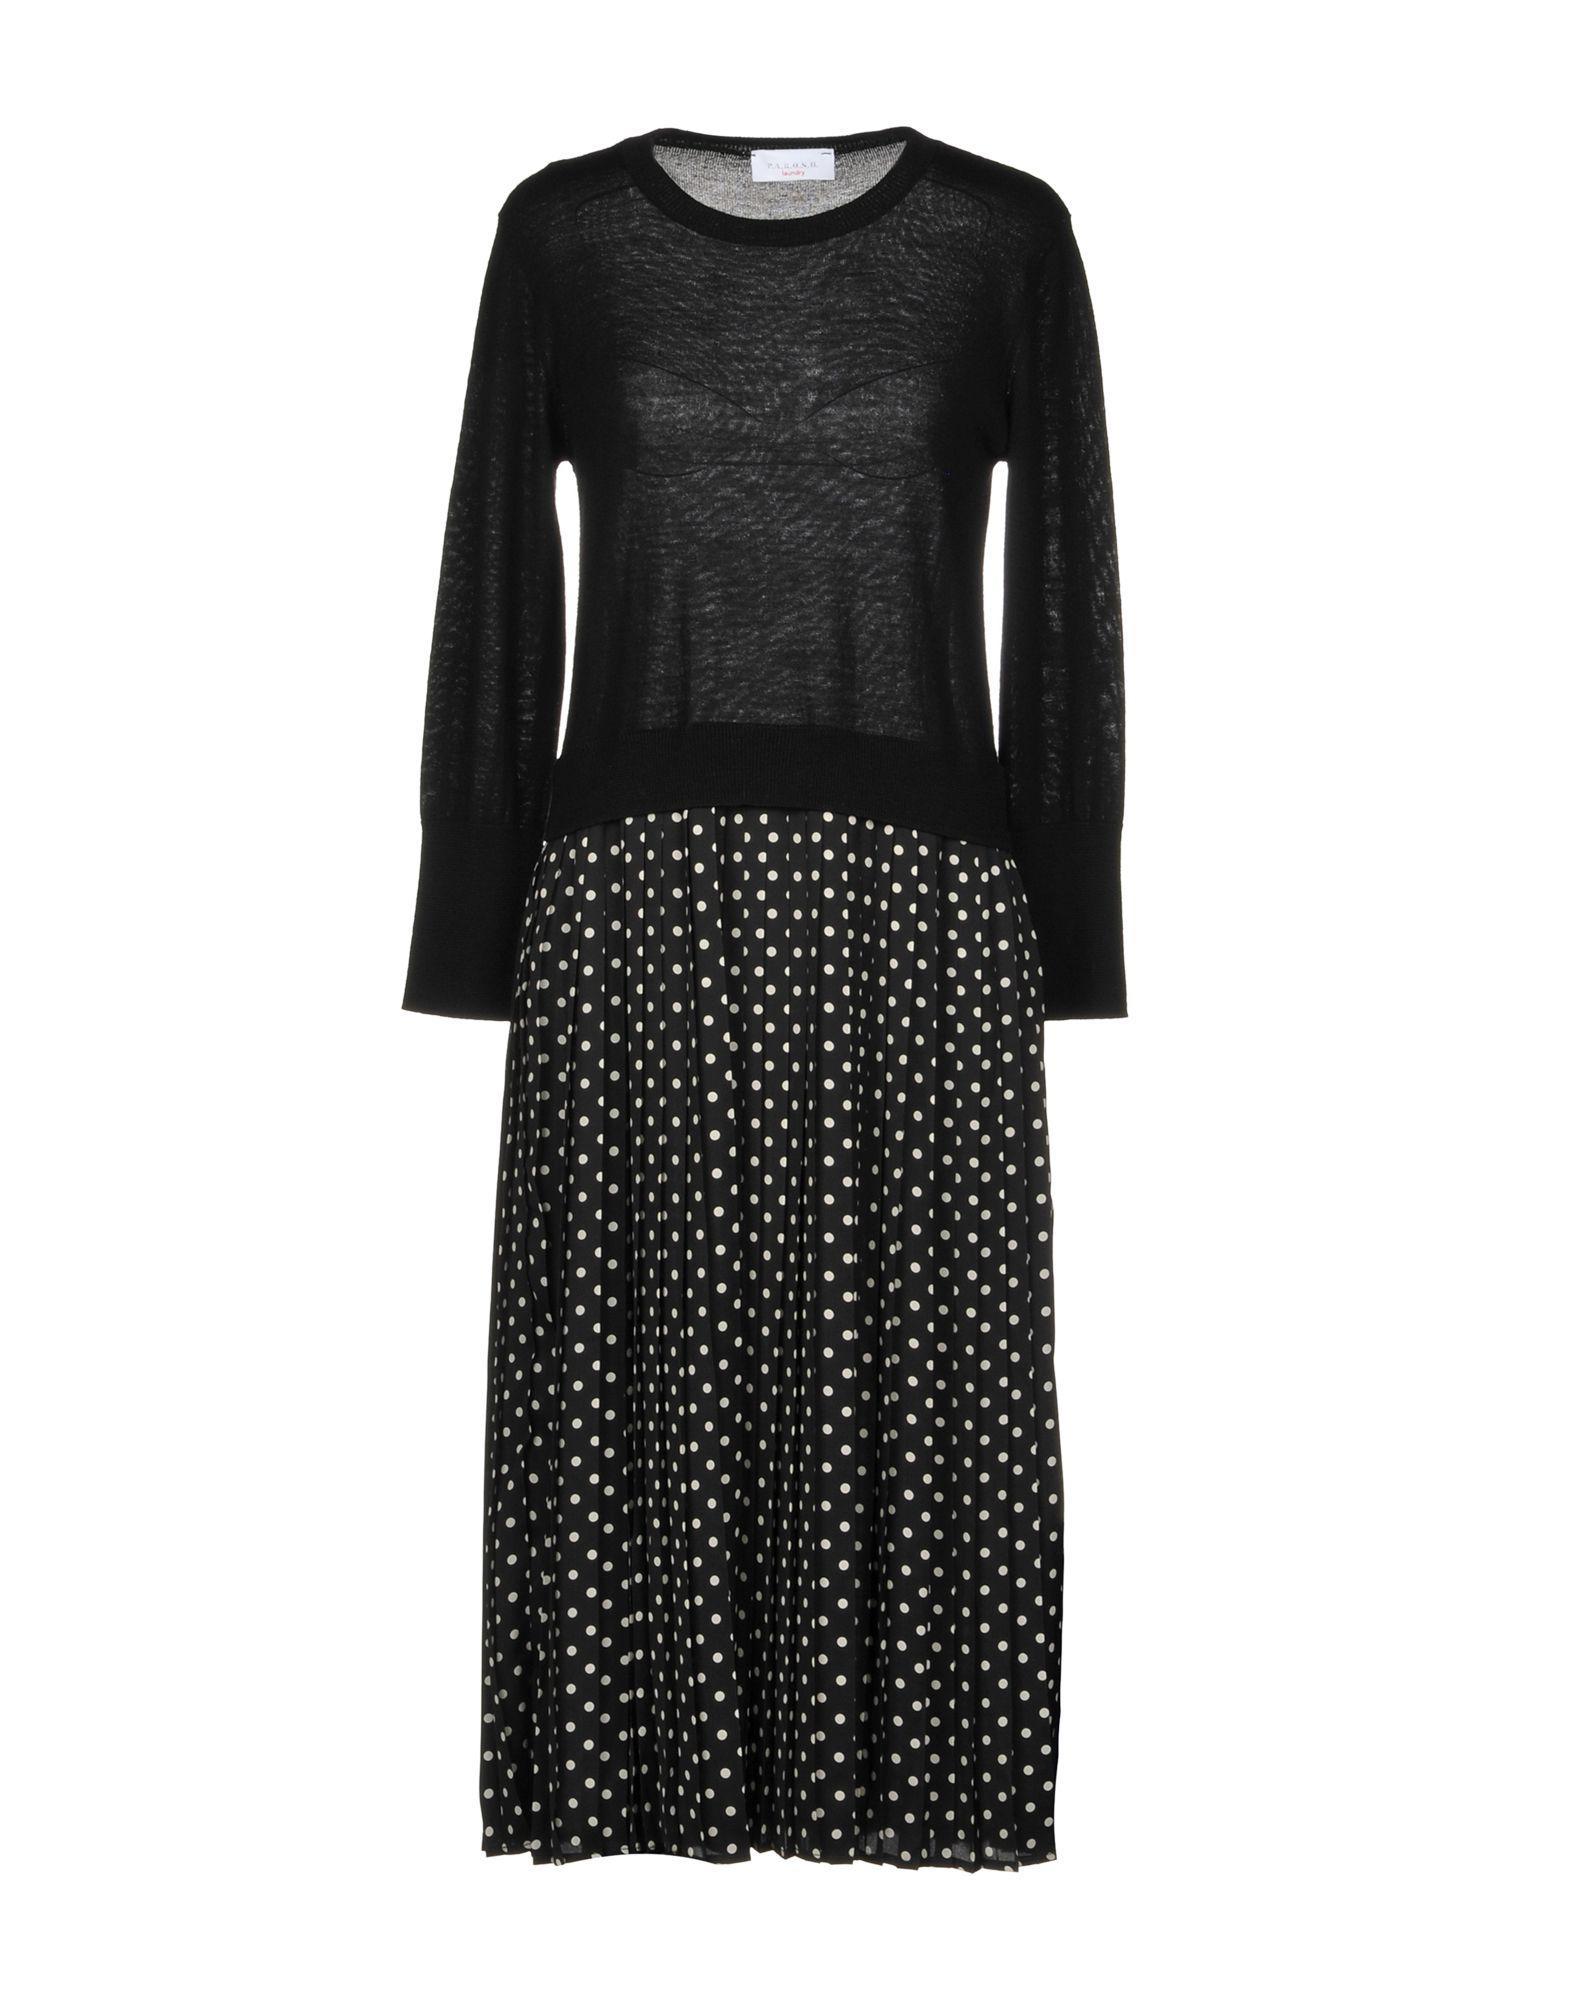 P.a.r.o.s.h. Knee-length Dress In Black